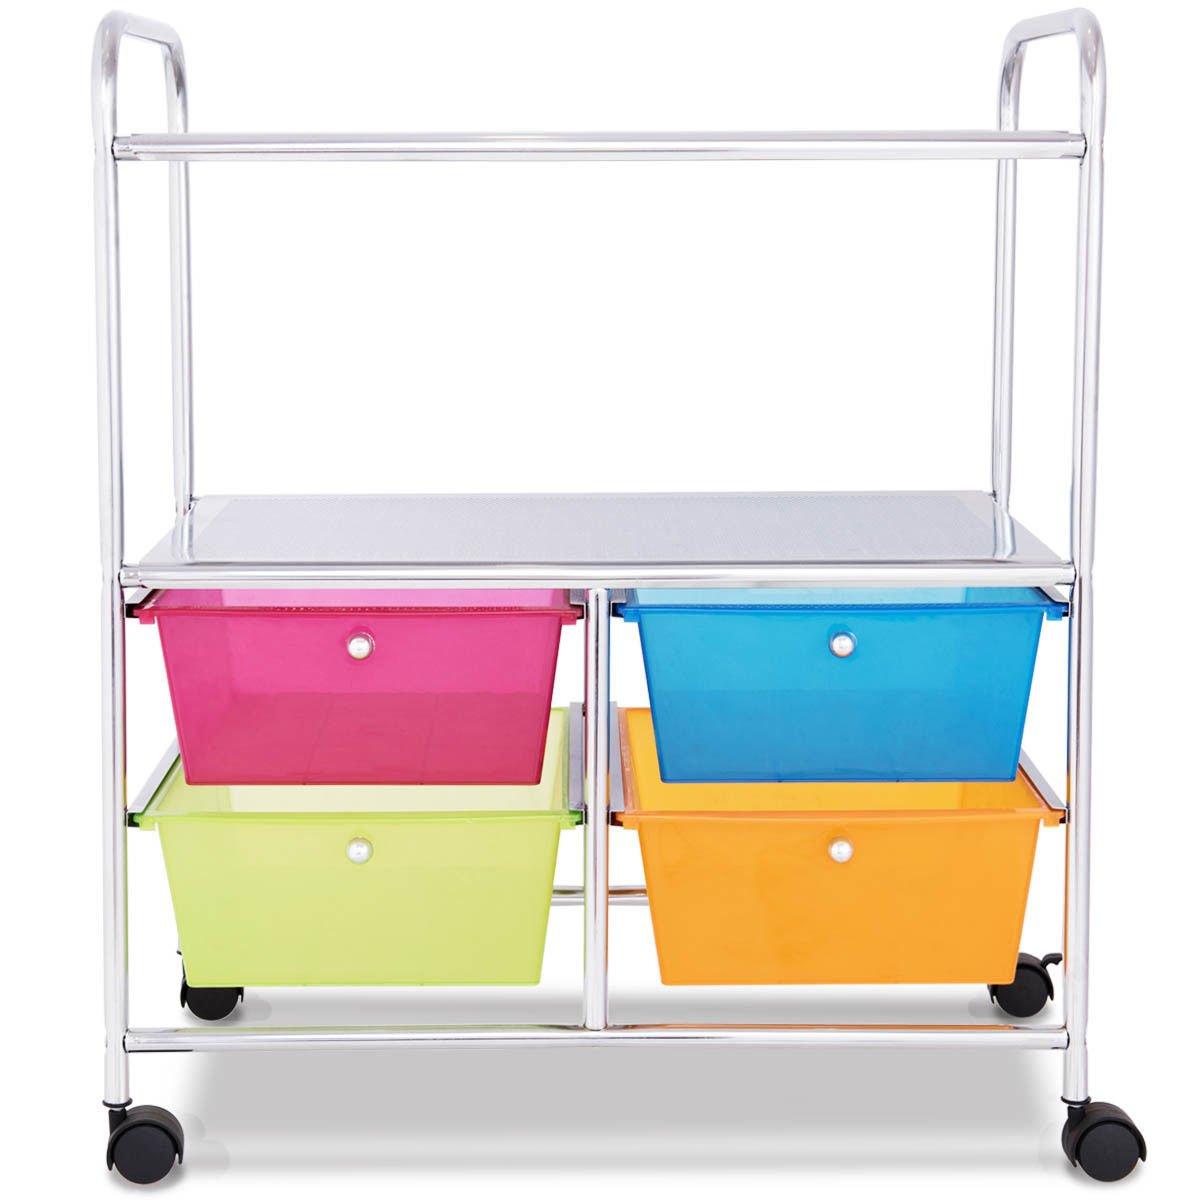 Giantex Rolling Storage Cart w/ 4 Drawers 2 Shelves Metal Rack Shelf Home Office School Beauty Salon Utility Organizer Cart with Wheels (Blue Green Orange & Red) by Giantex (Image #9)